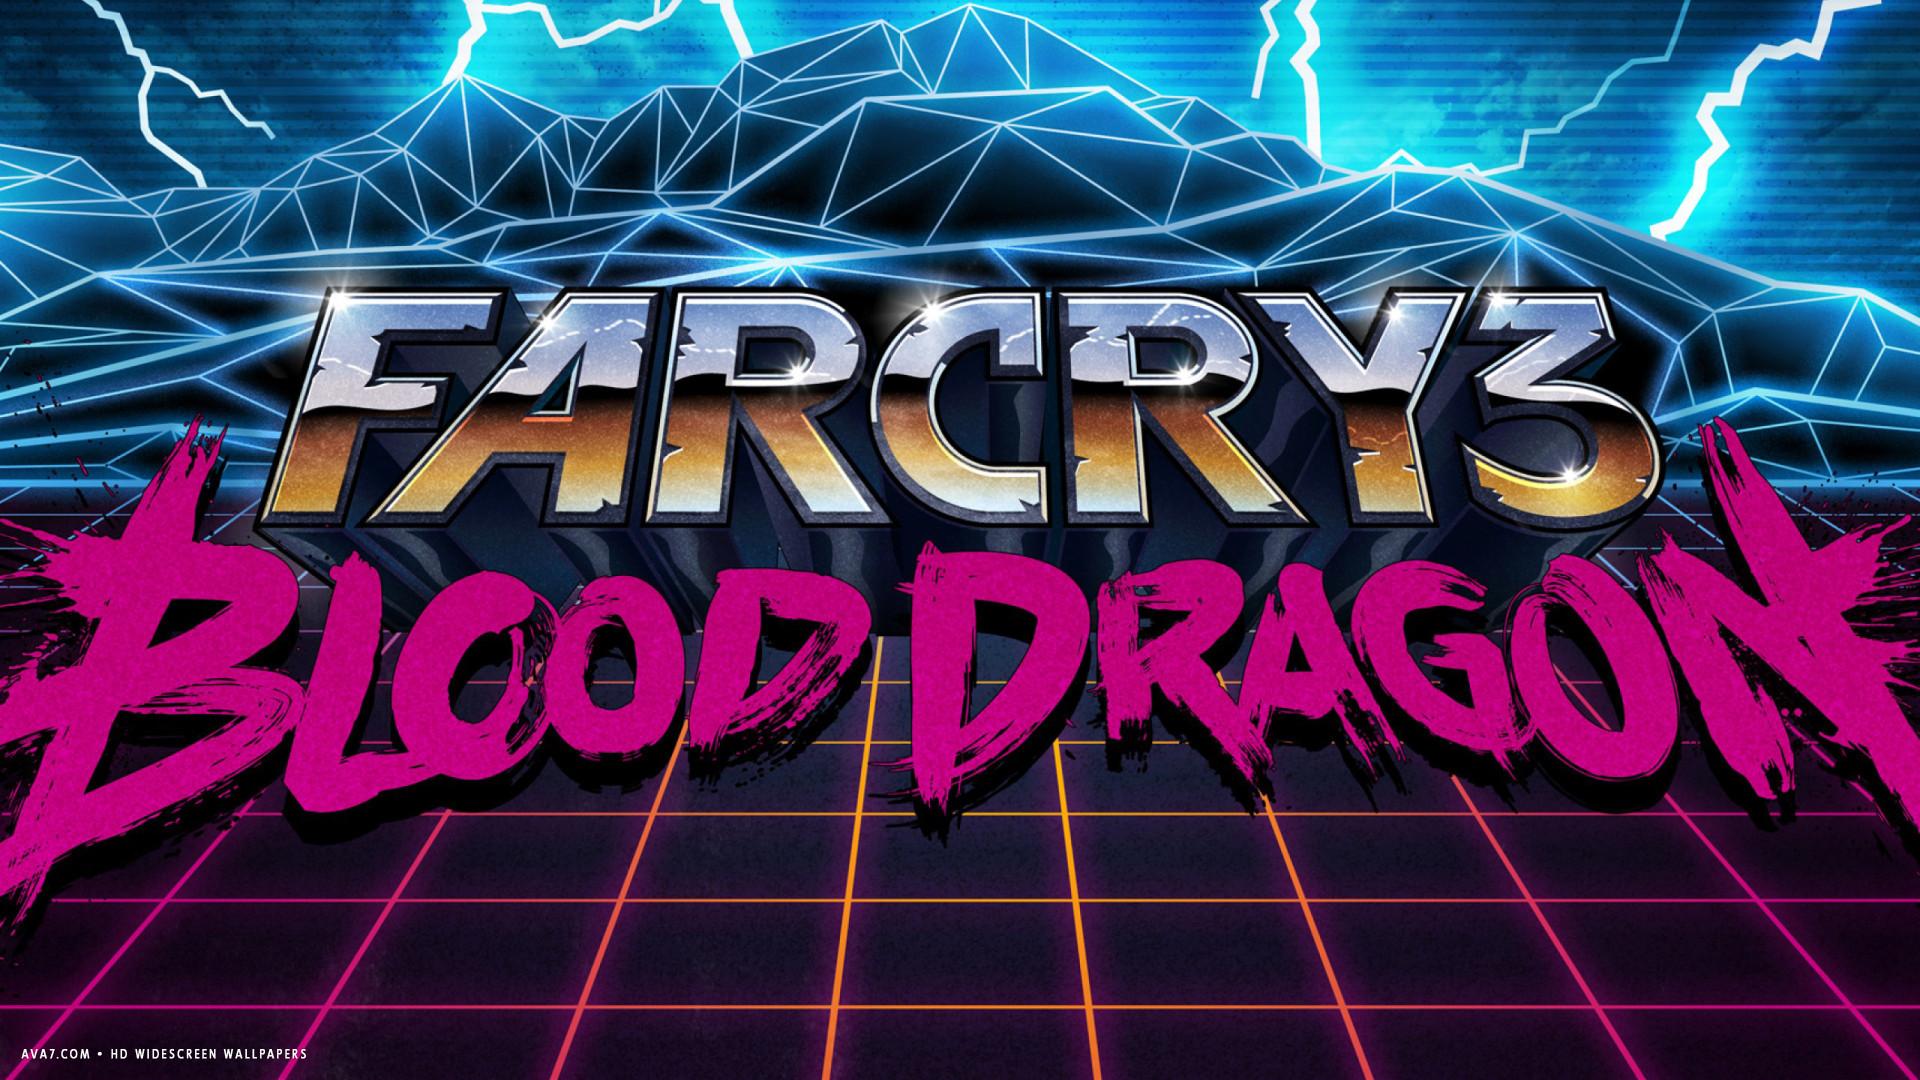 Far Cry 3 Blood Dragon Game Logo Hd Widescreen Wallpaper Games